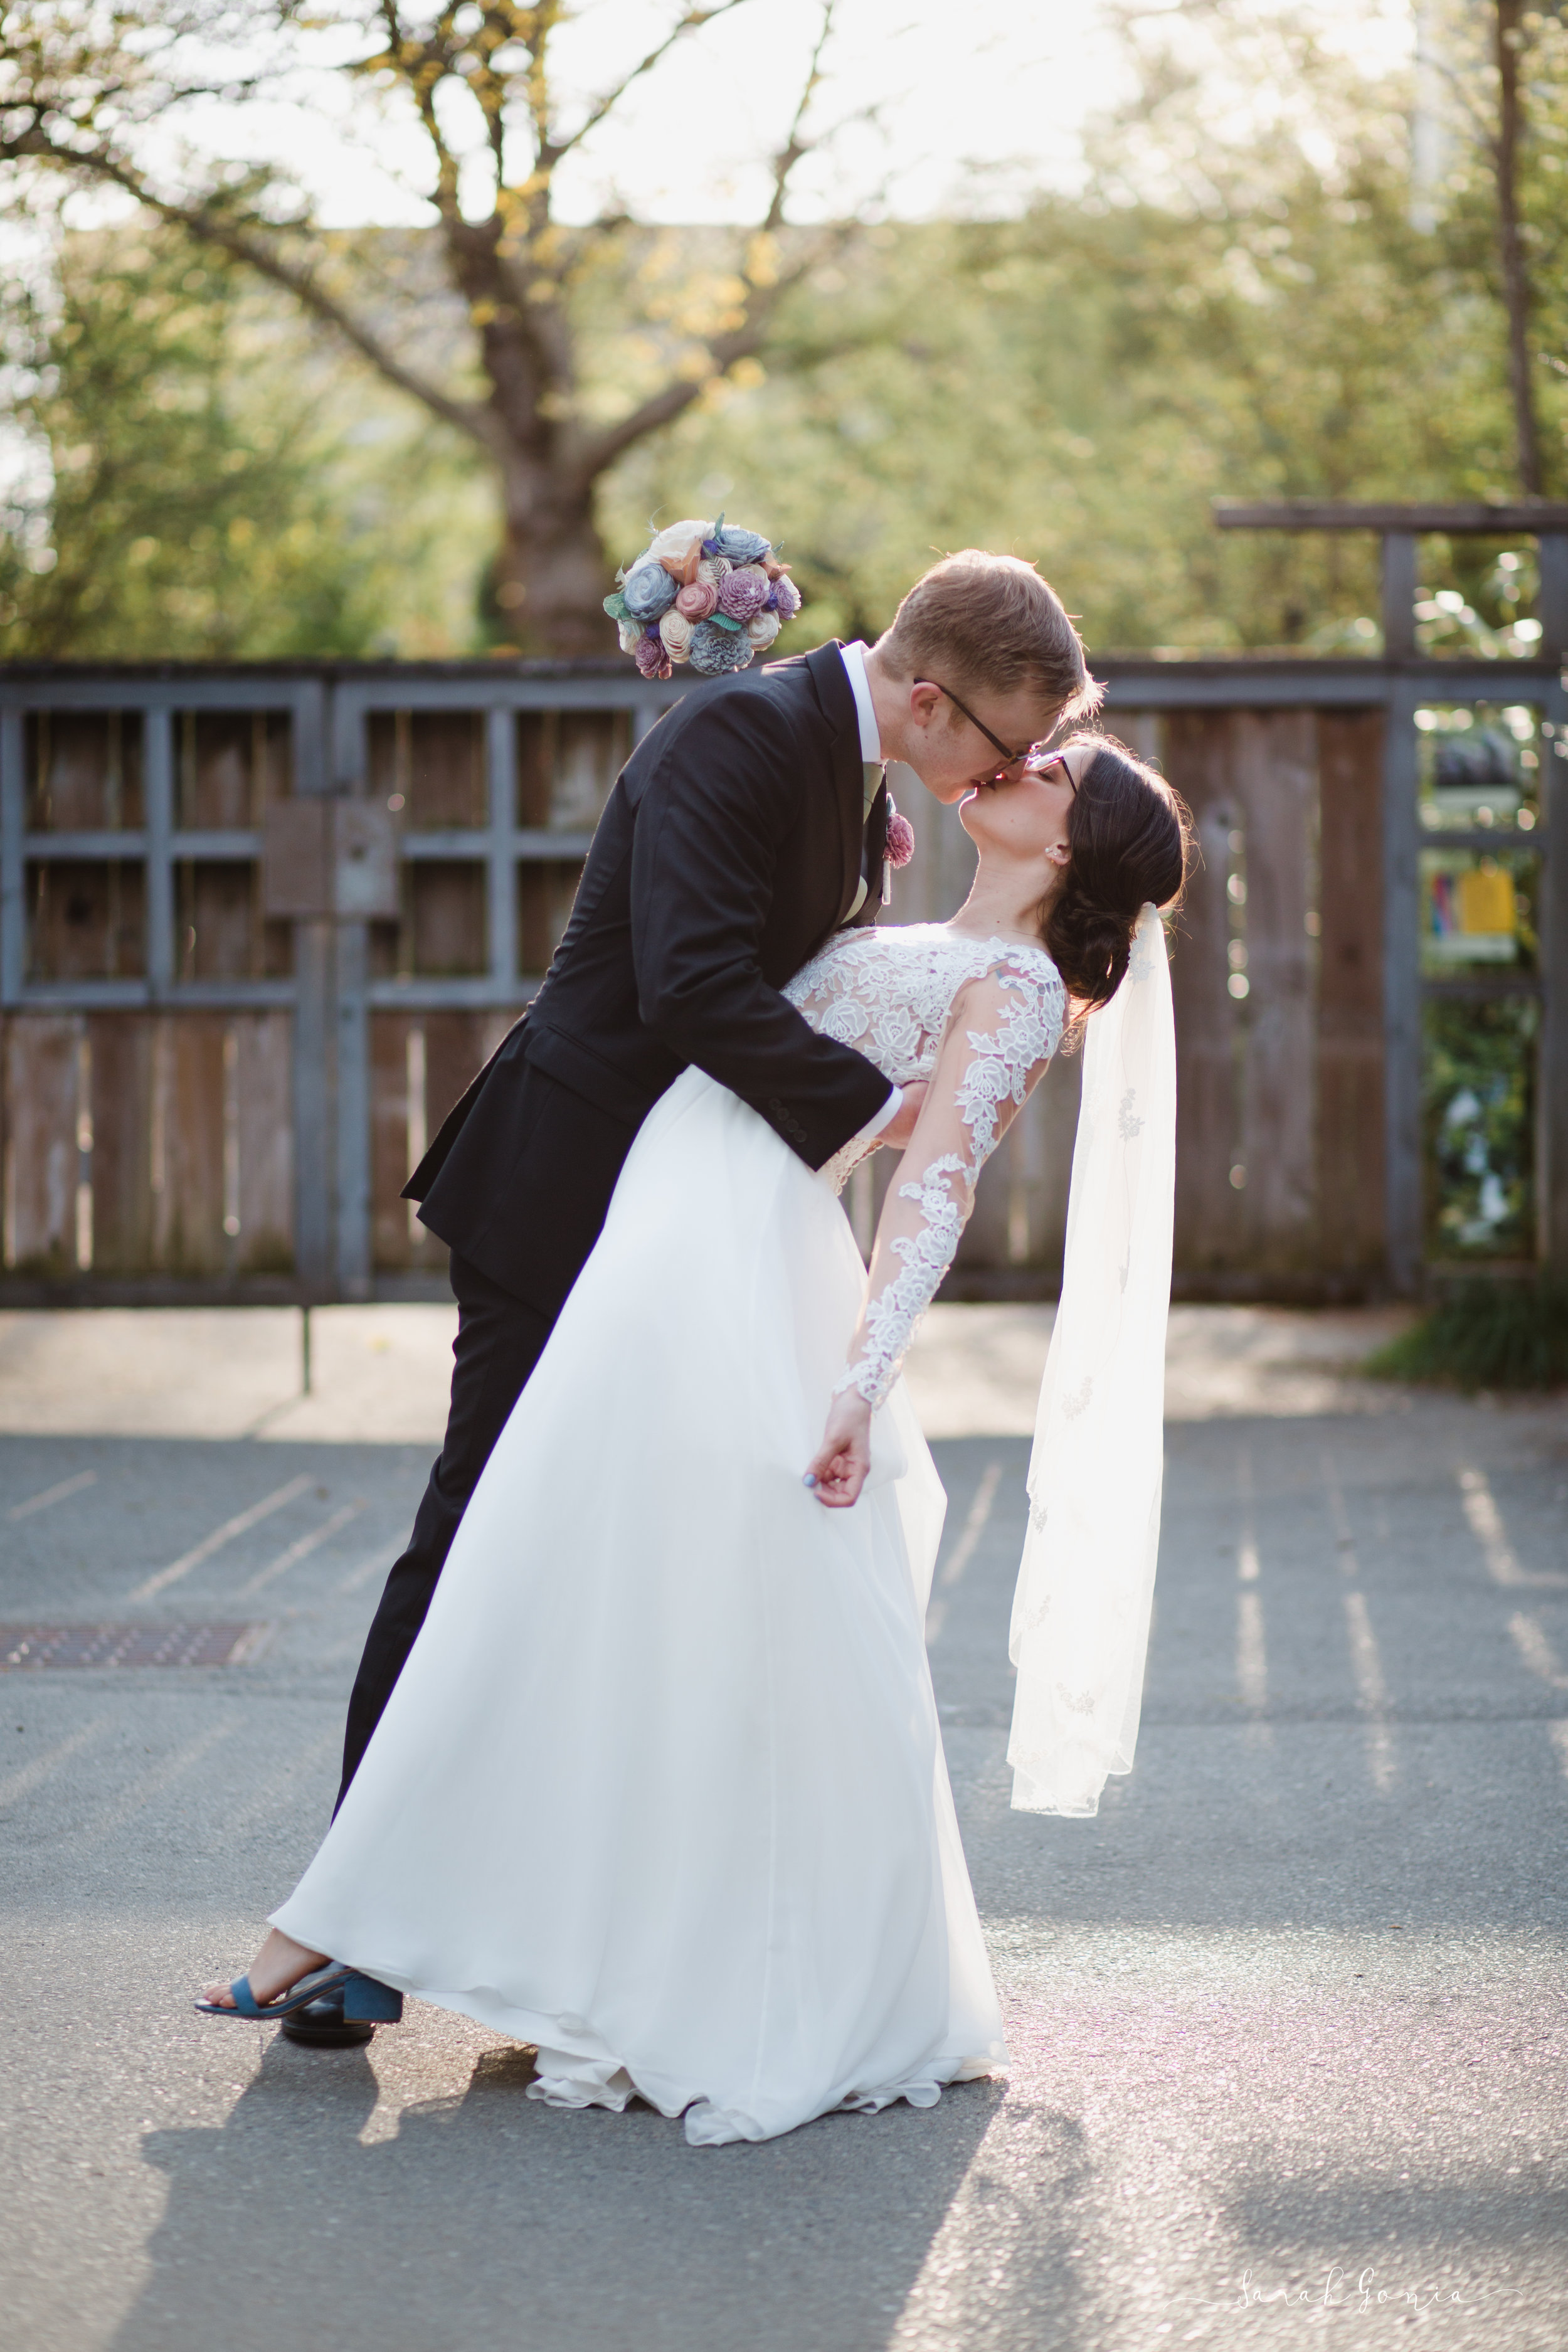 Woodland Park Zoo Wedding | Olympia Wedding Photographer